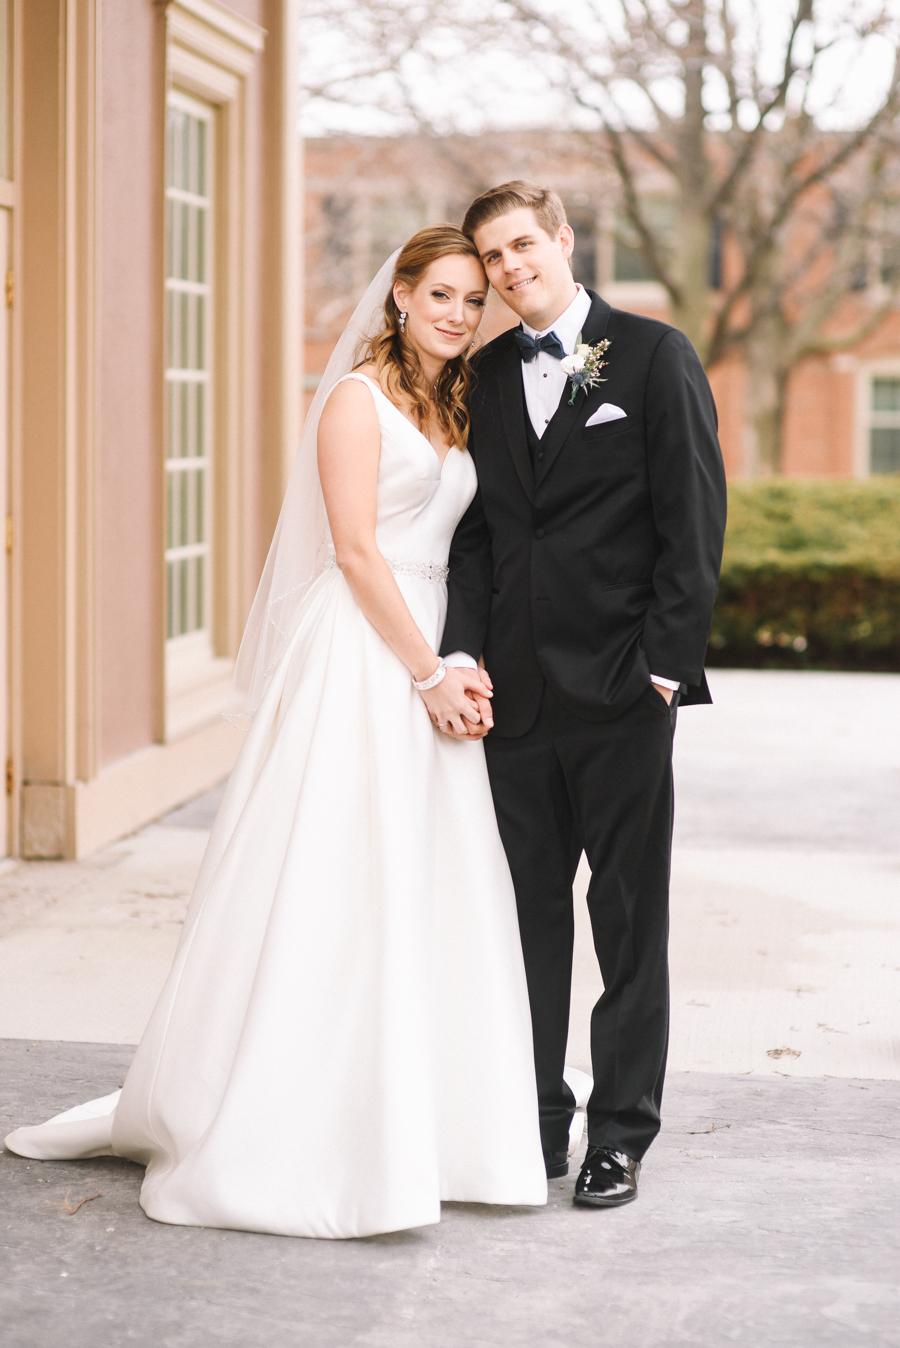 Dearborn_Inn_Wedding-55.jpg